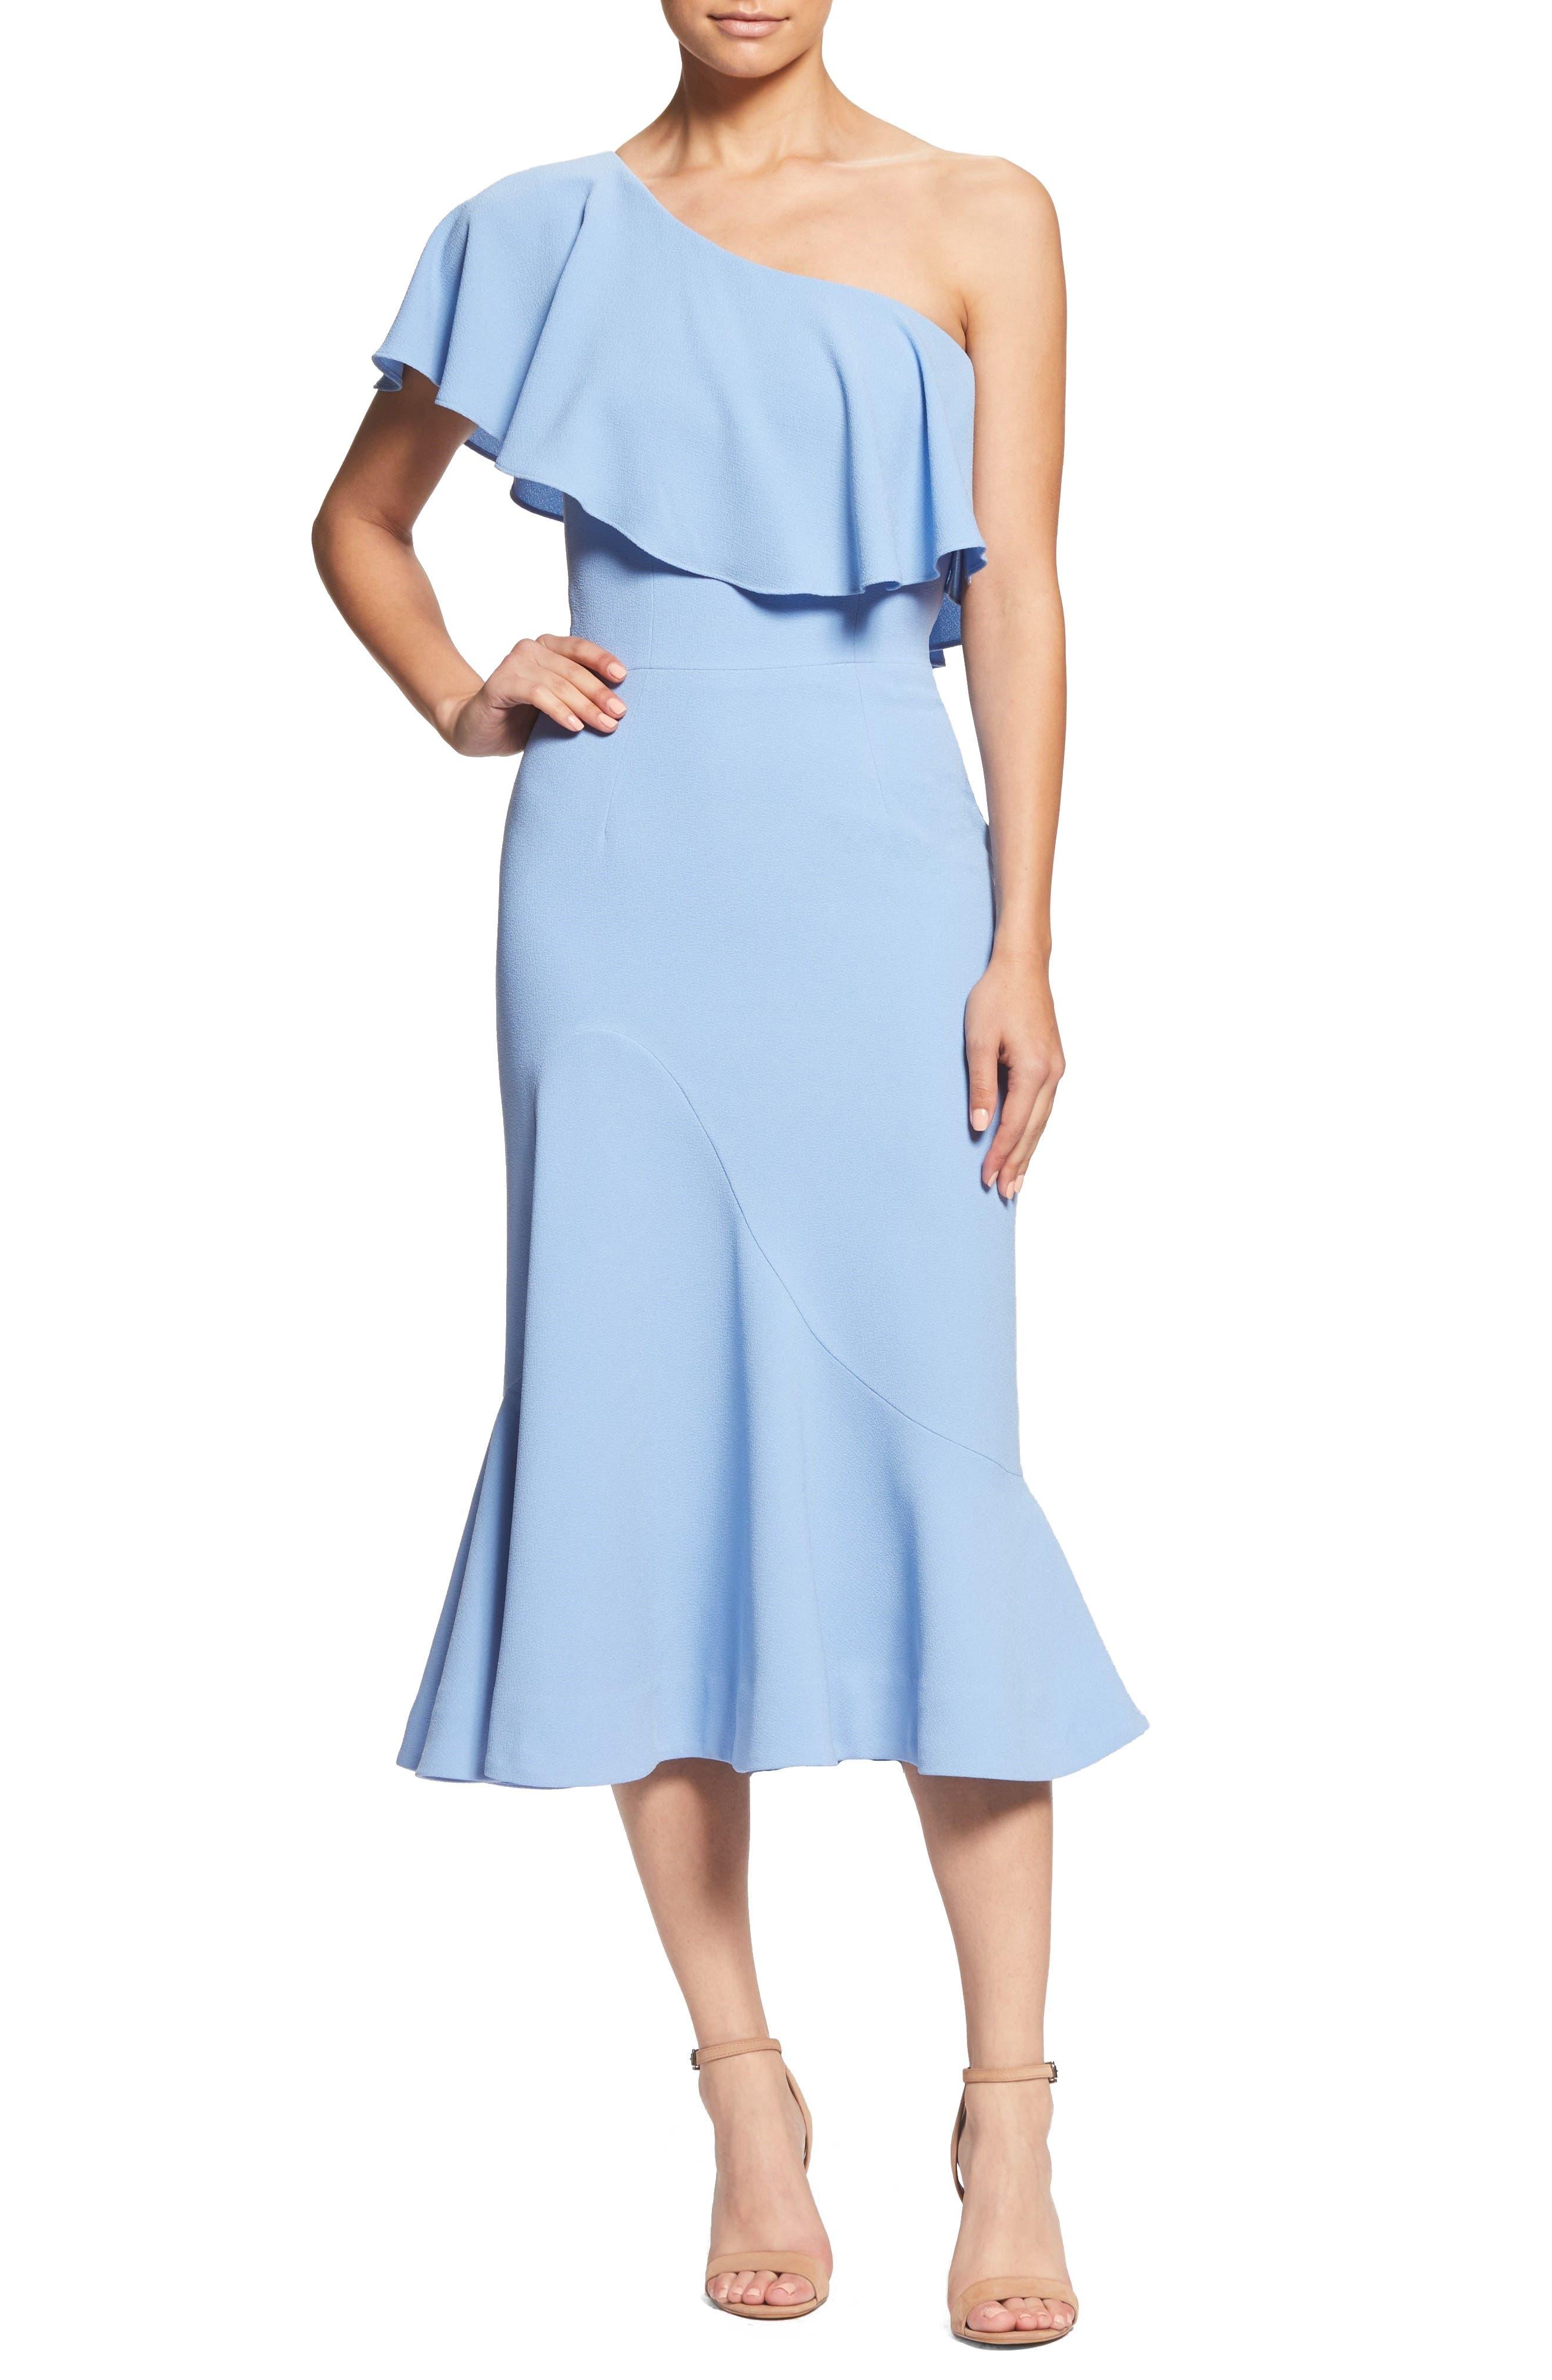 Raquel One-Shoulder Trumpet Dress,                         Main,                         color, Ice Blue